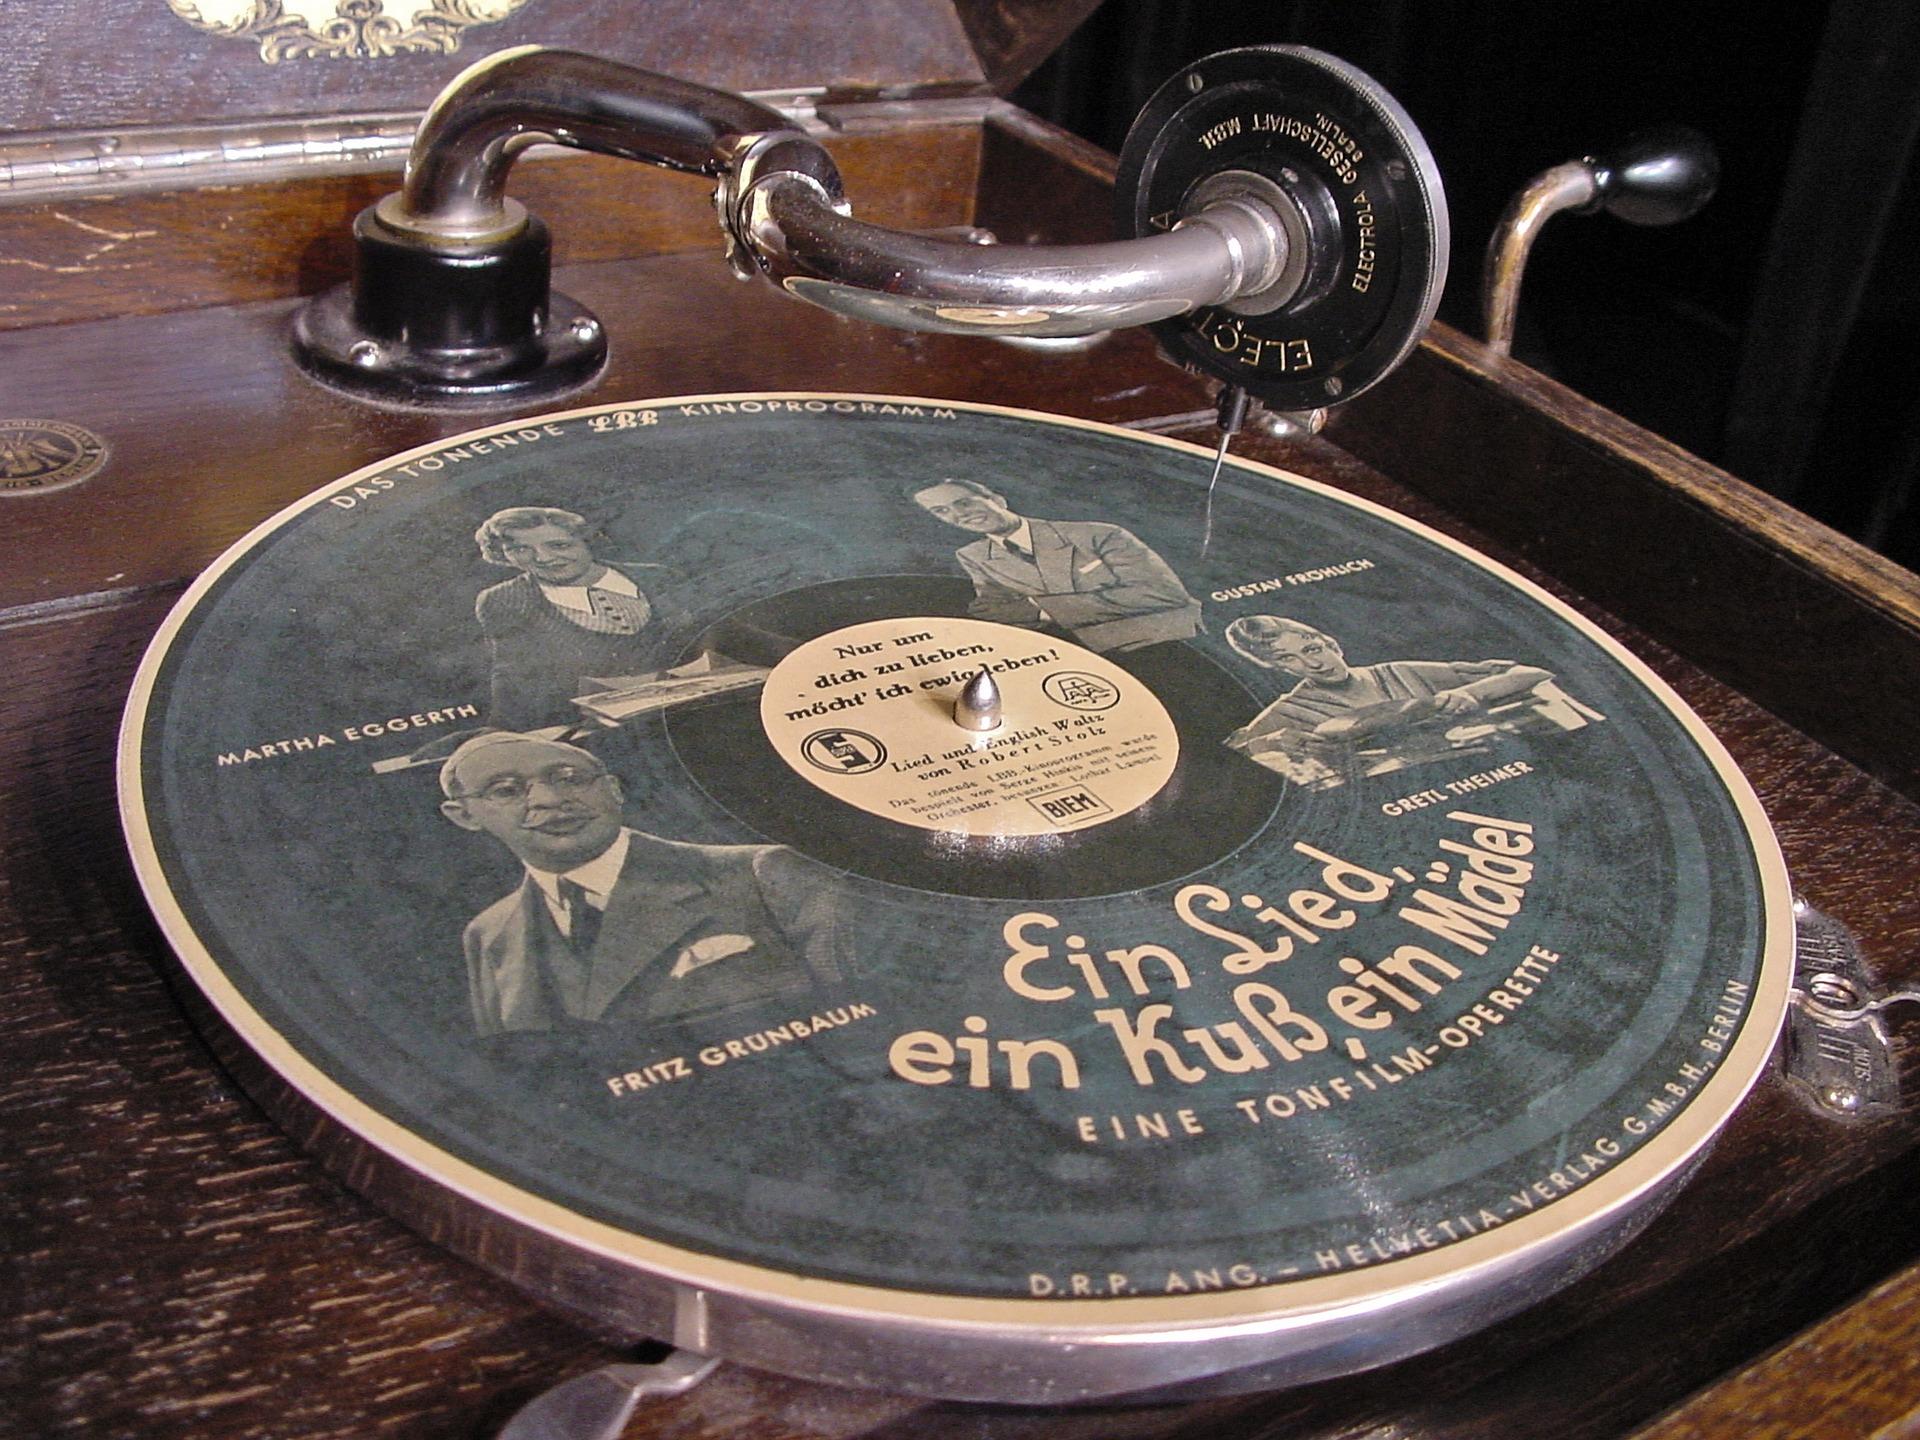 fonograf, gramofon, płyta gramofonowa, dźwięk